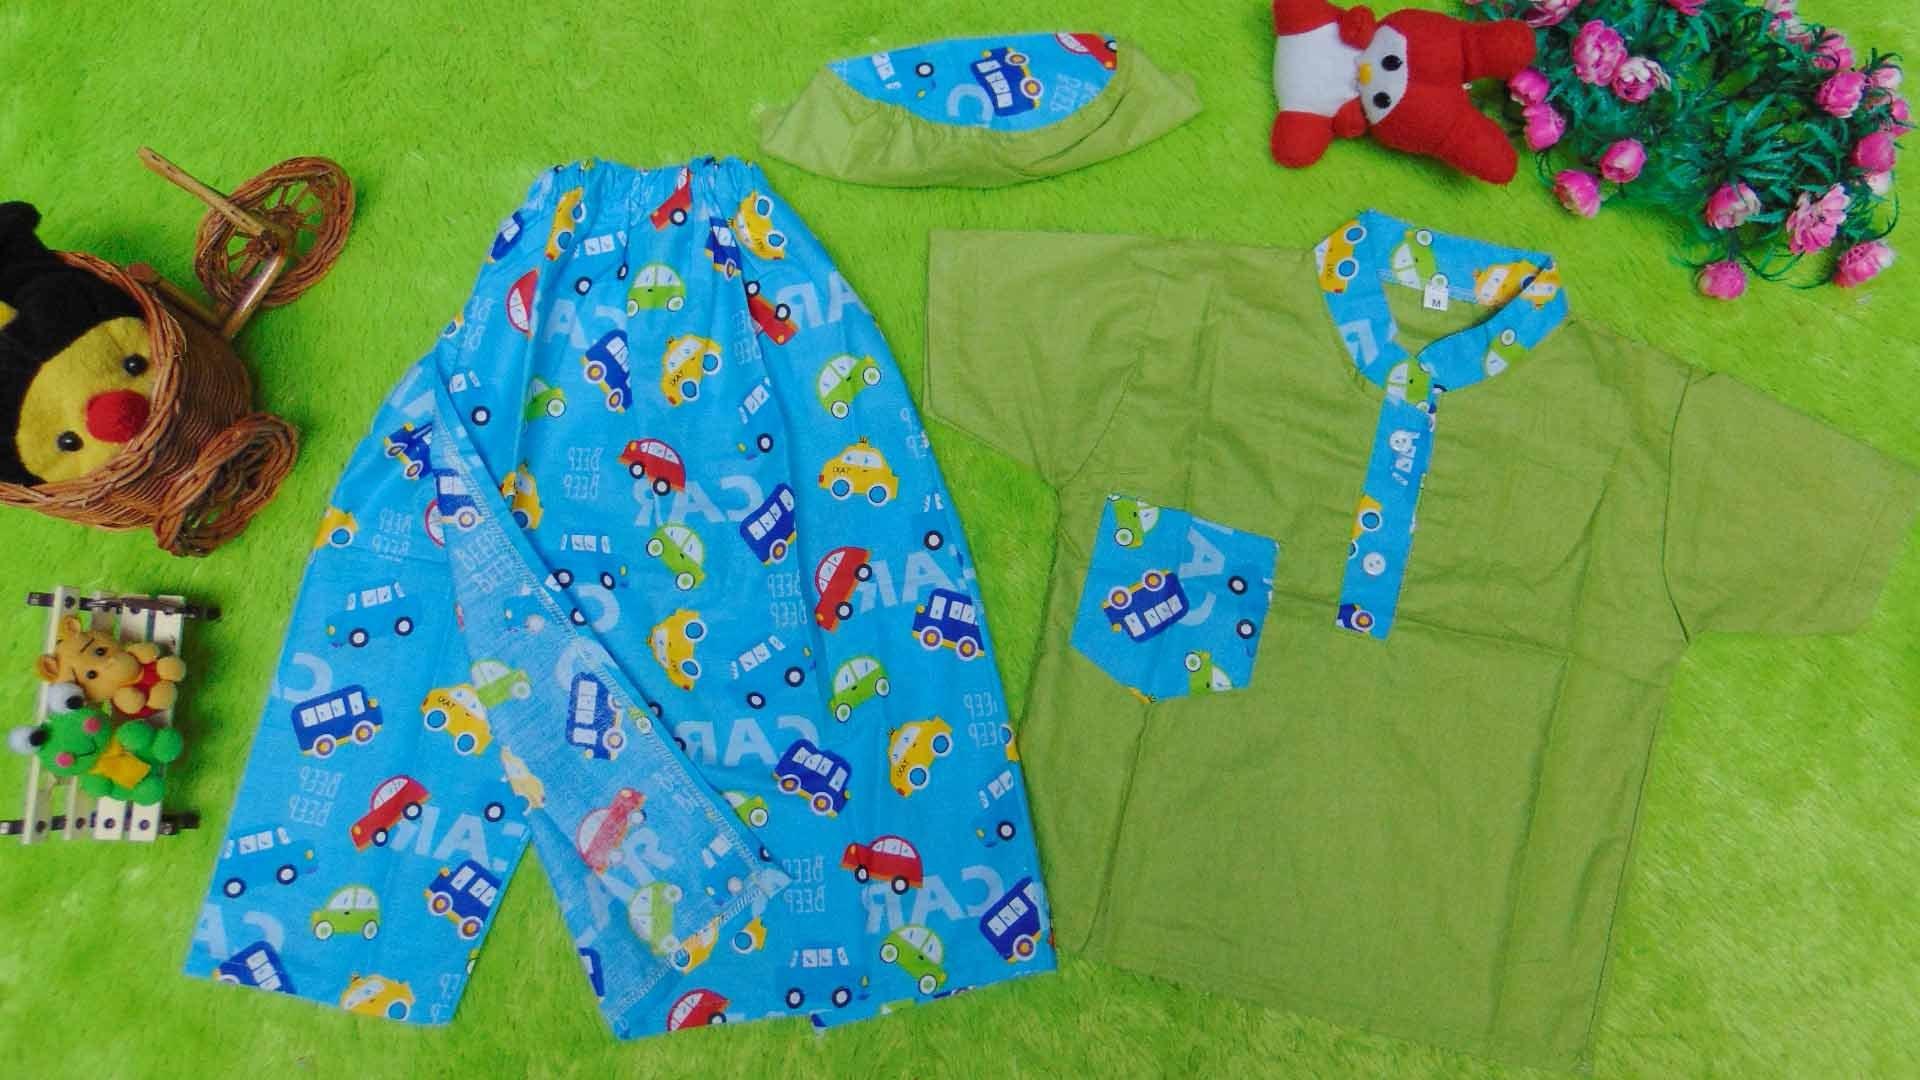 Ide Baju Lebaran Anak 1 Tahun T8dj Baju Lebaran Koko Setelan Baju Muslim Sarkoci Sarung Koko